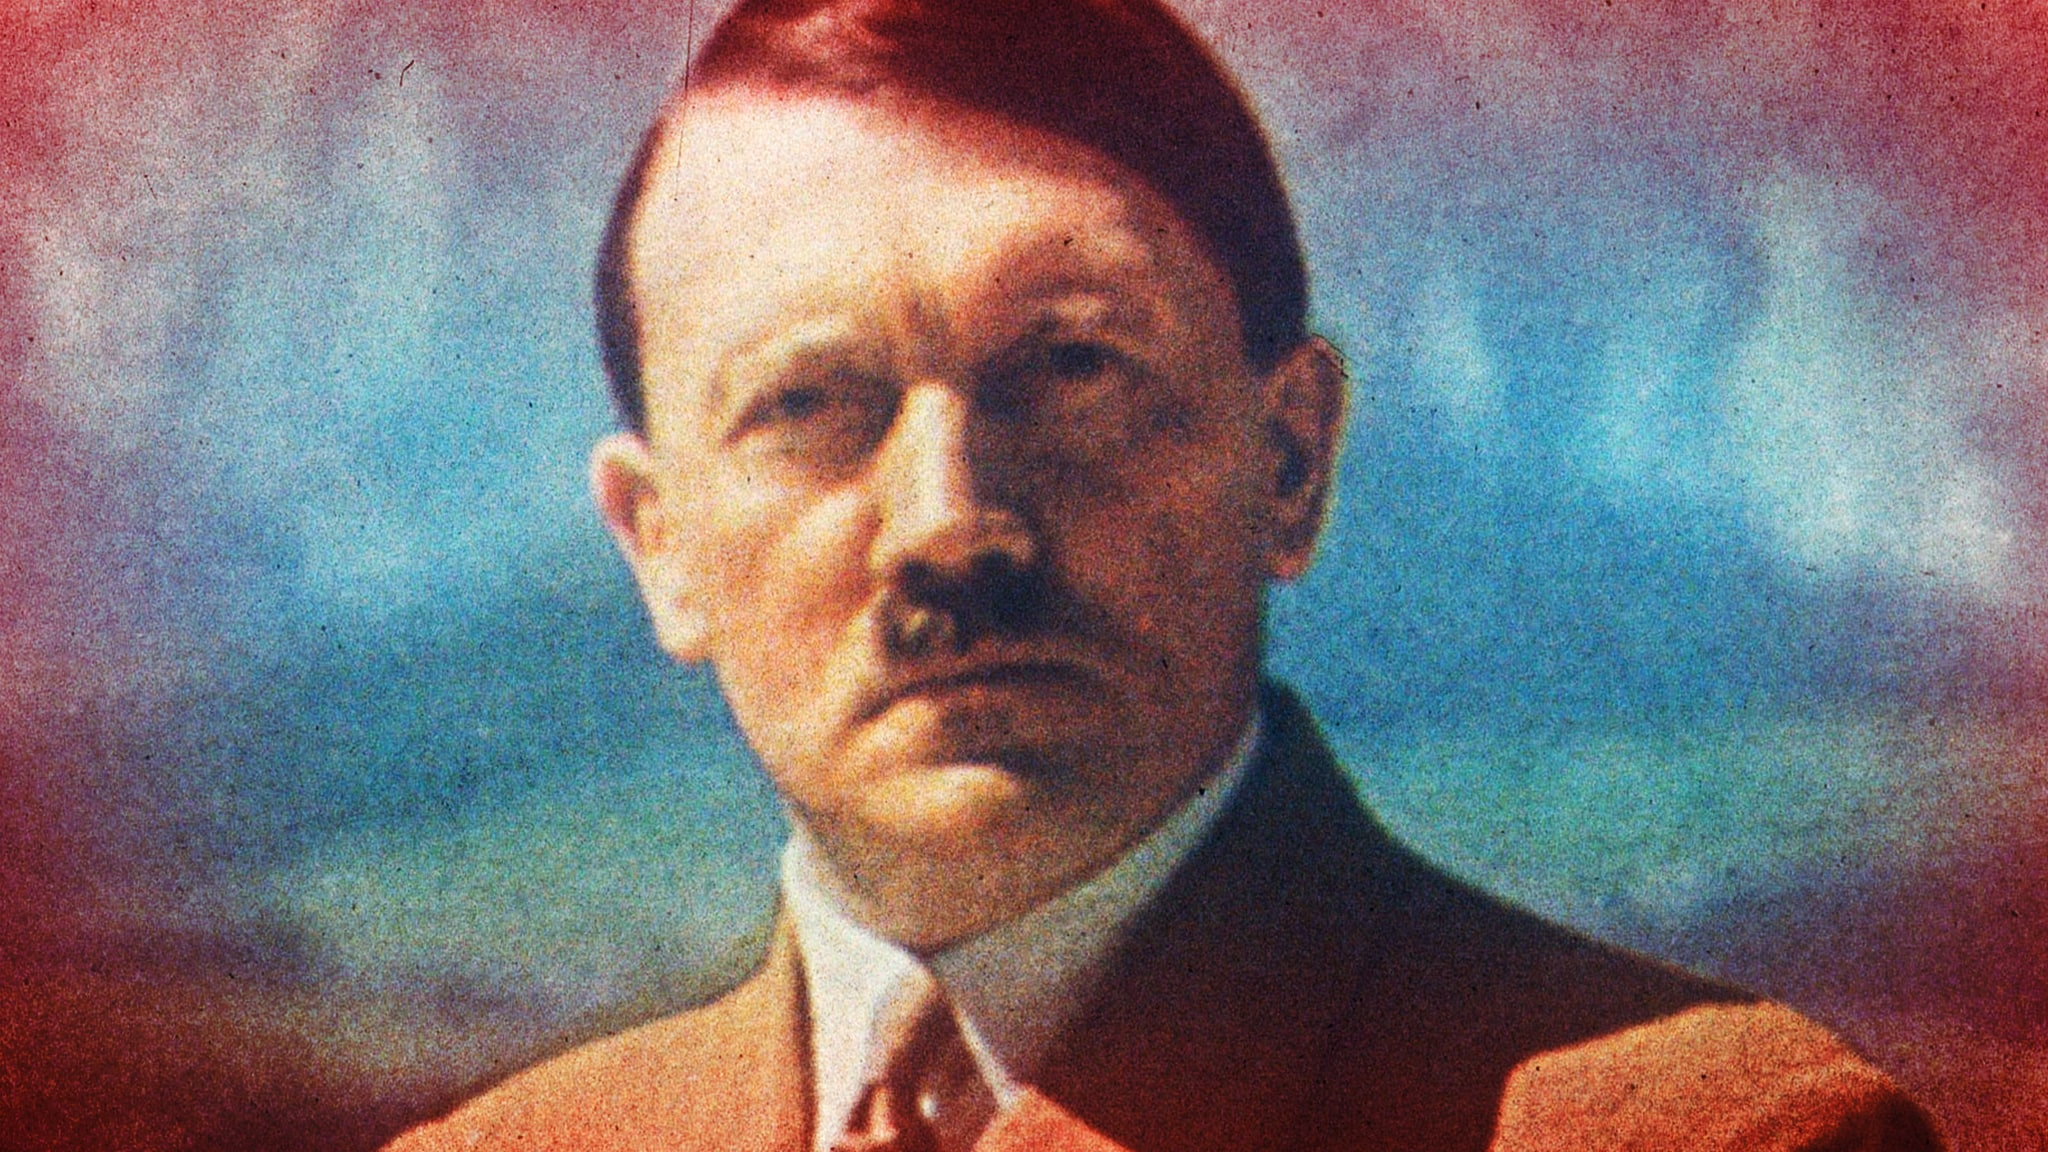 Rai Storia Cronache di Hitler - Pt2